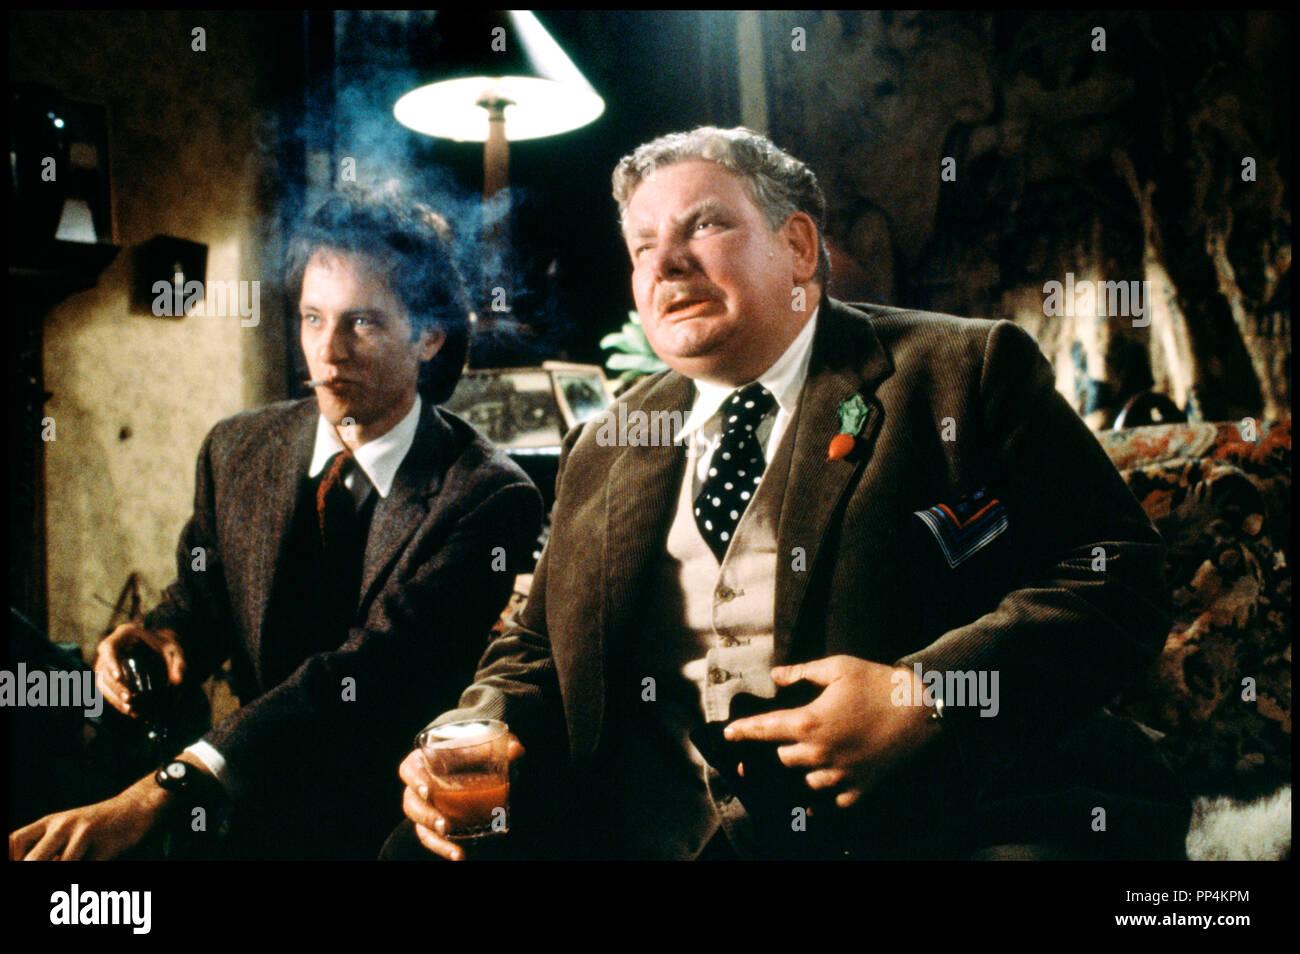 Prod DB © Handmade Films / DR WITHNAIL ET MOI (WITHNAIL & I) de Bruce Robinson 1987 GB cigarette, - Stock Image